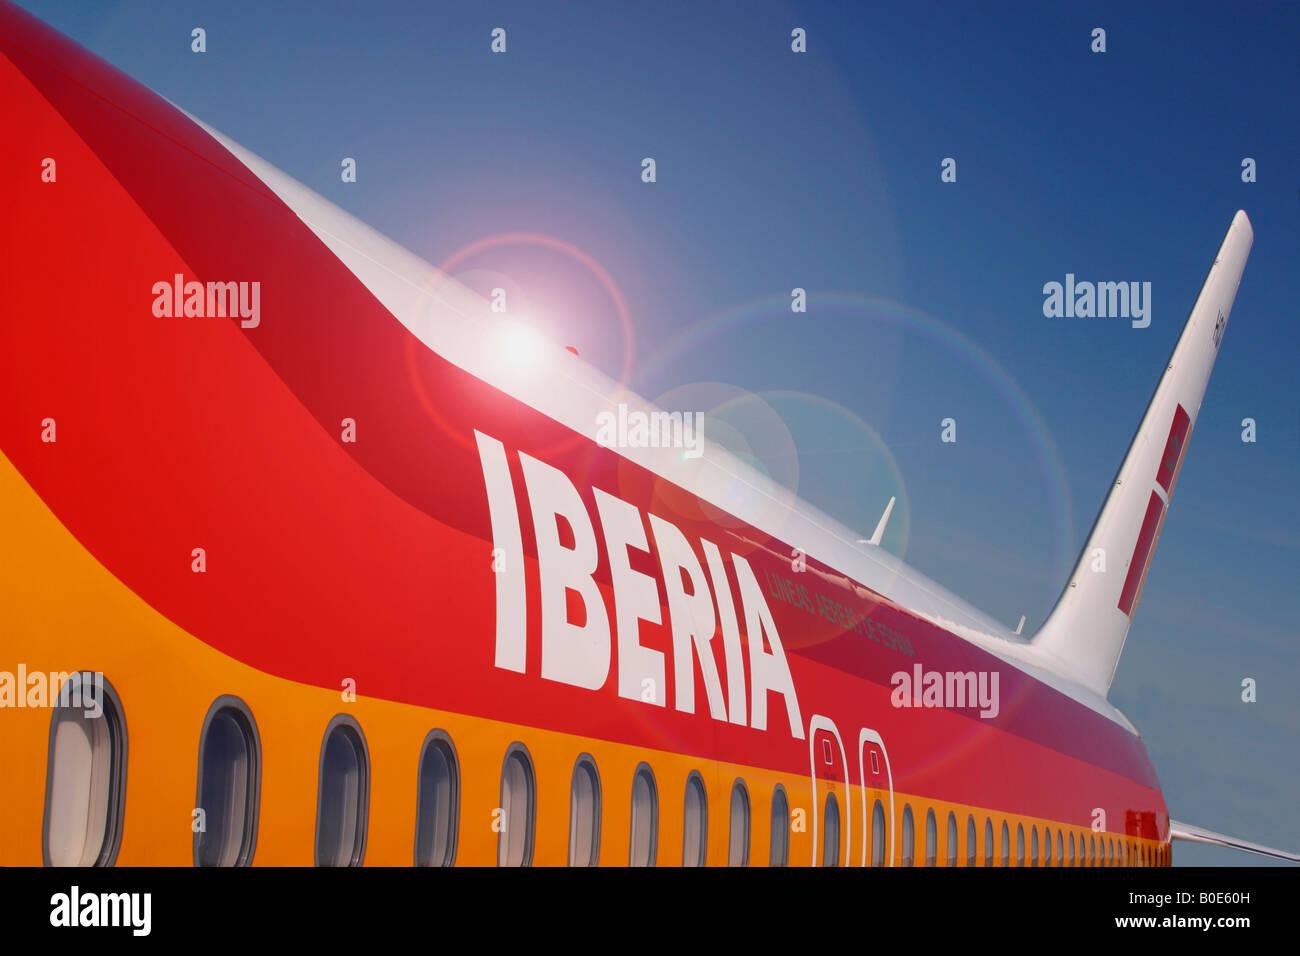 Iberia Airways jet fuselage logo at Madrid International Airport Madrid Spain Europe EU - Stock Image